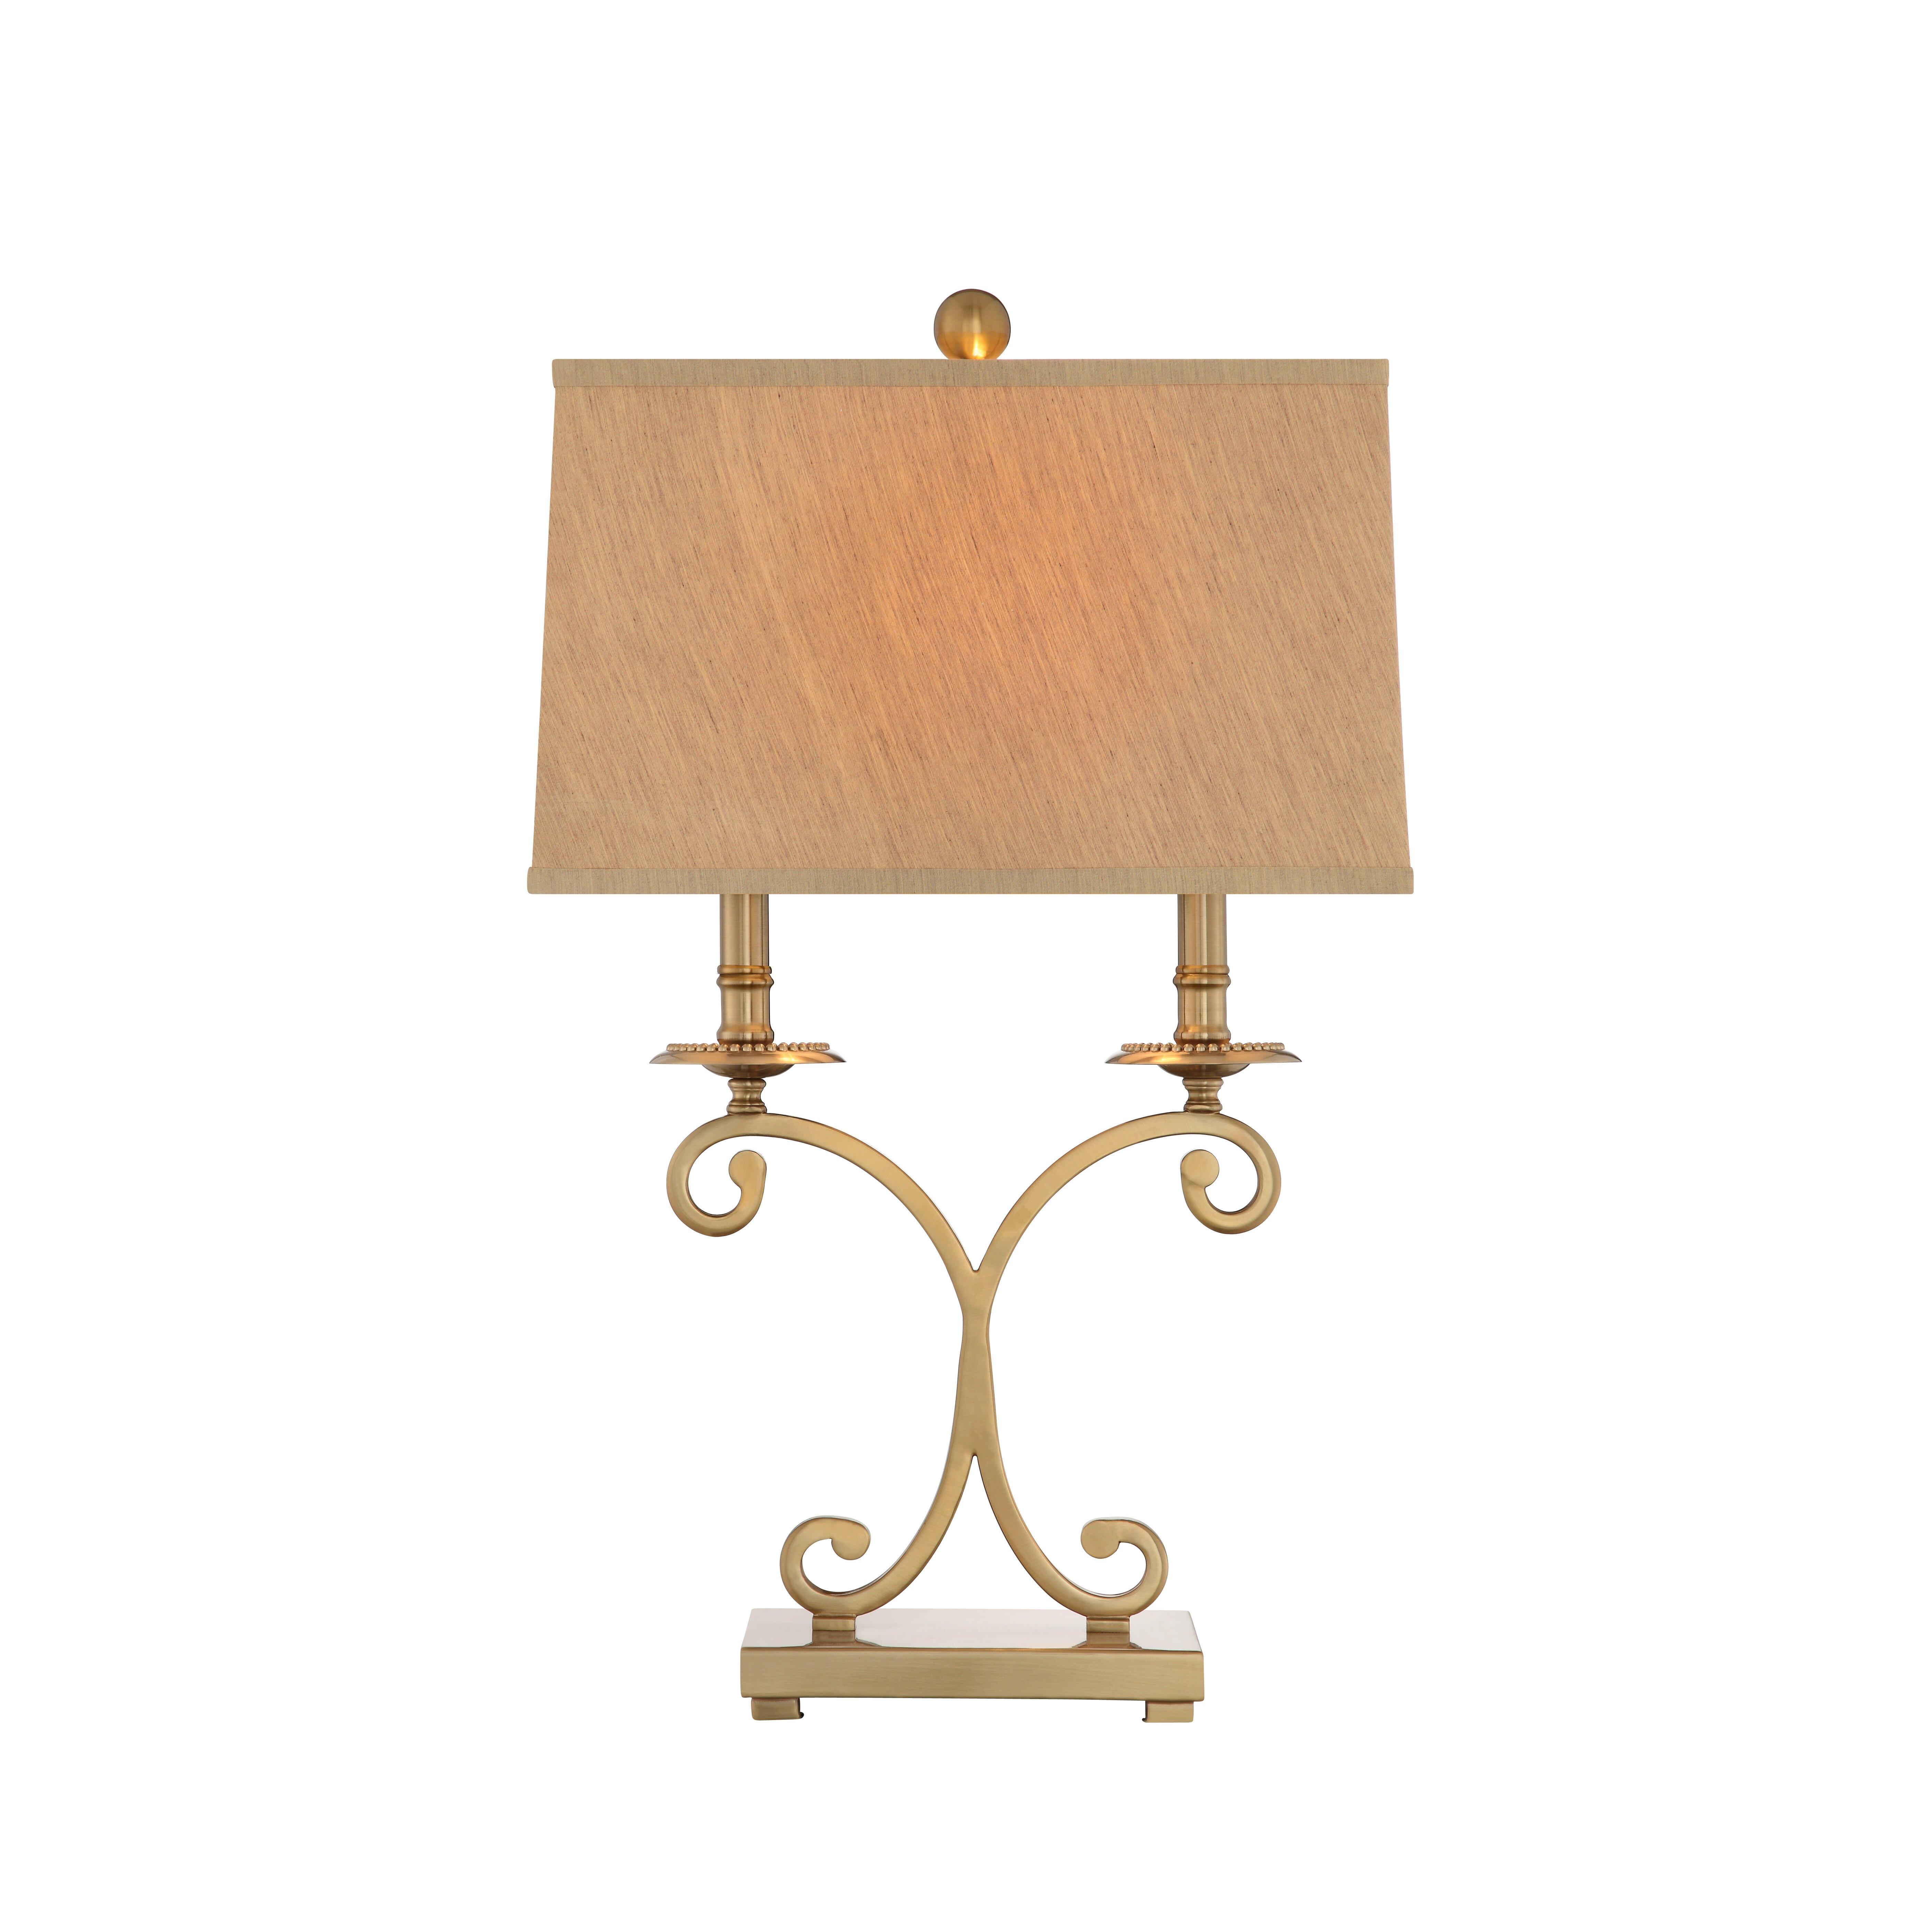 lighting lamps table lamps catalina lighting sku ilum1208. Black Bedroom Furniture Sets. Home Design Ideas